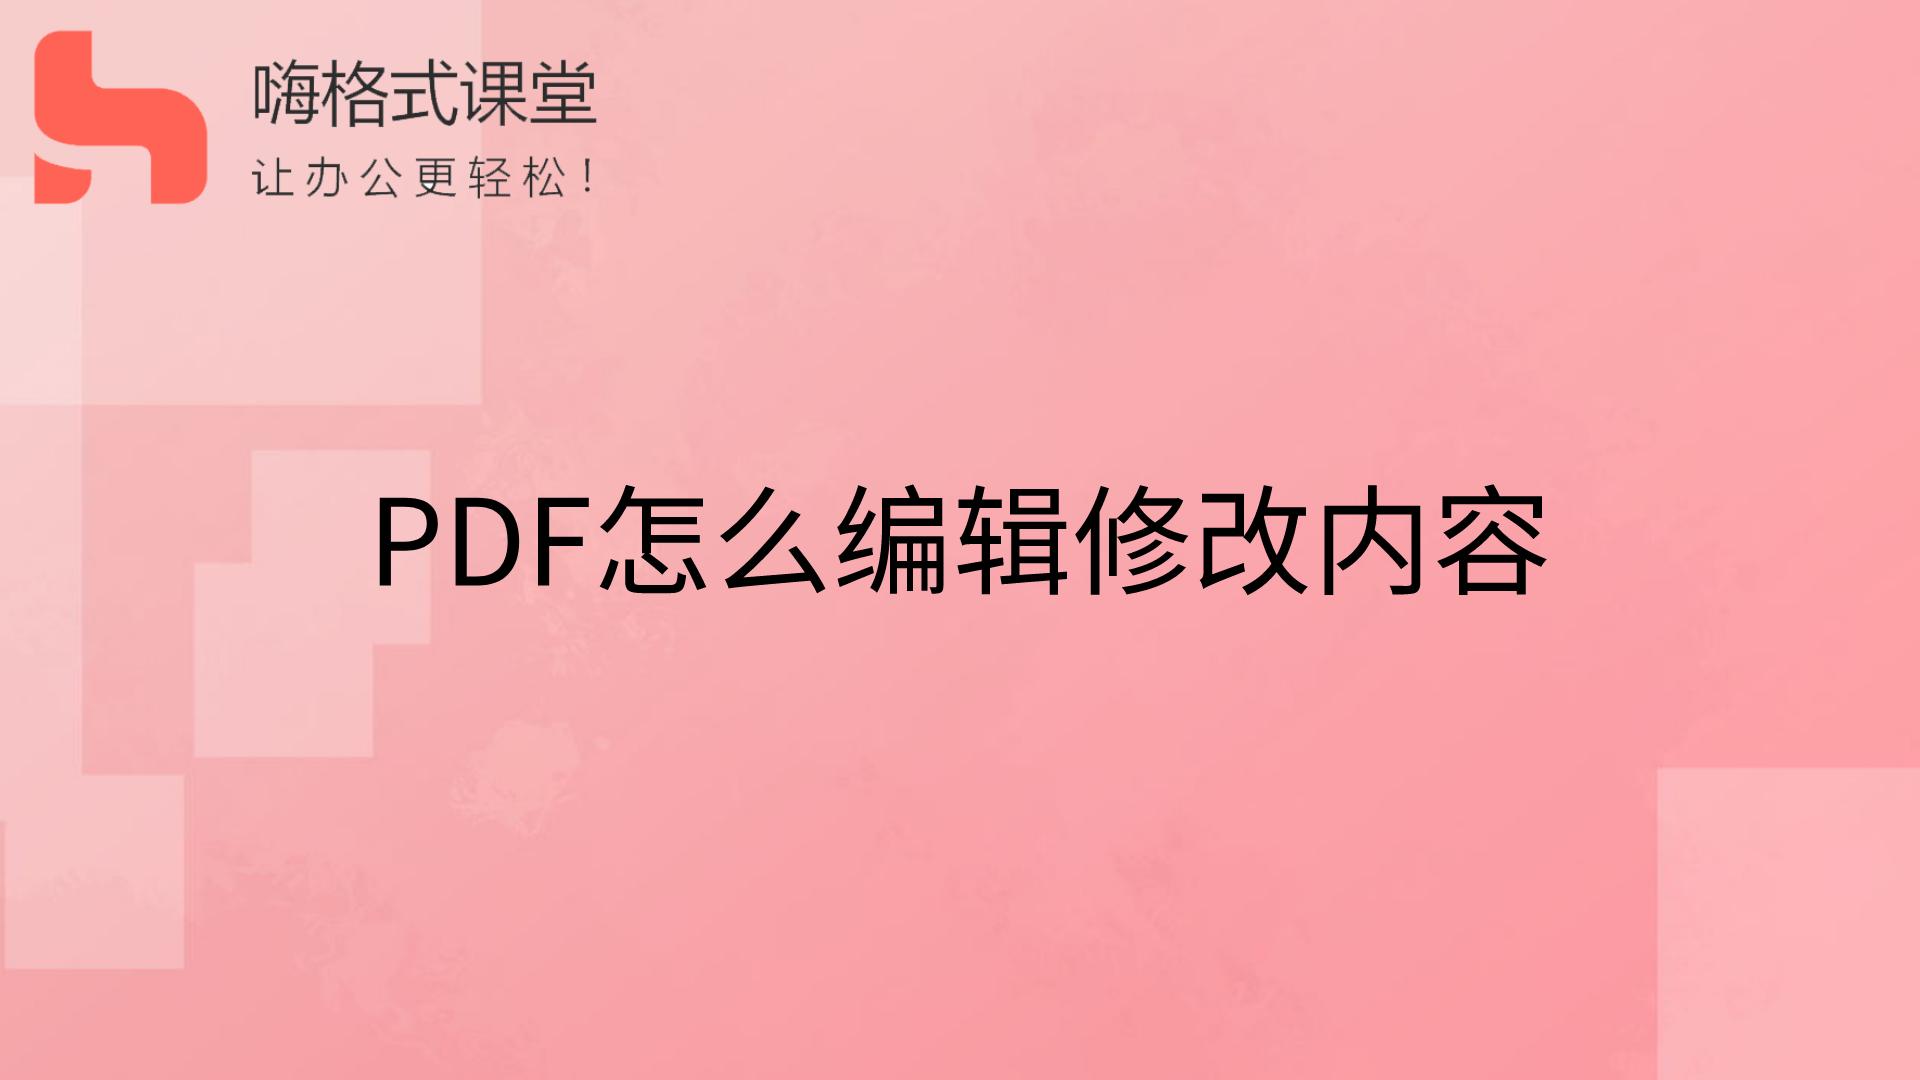 PDF怎么编辑修改内容s